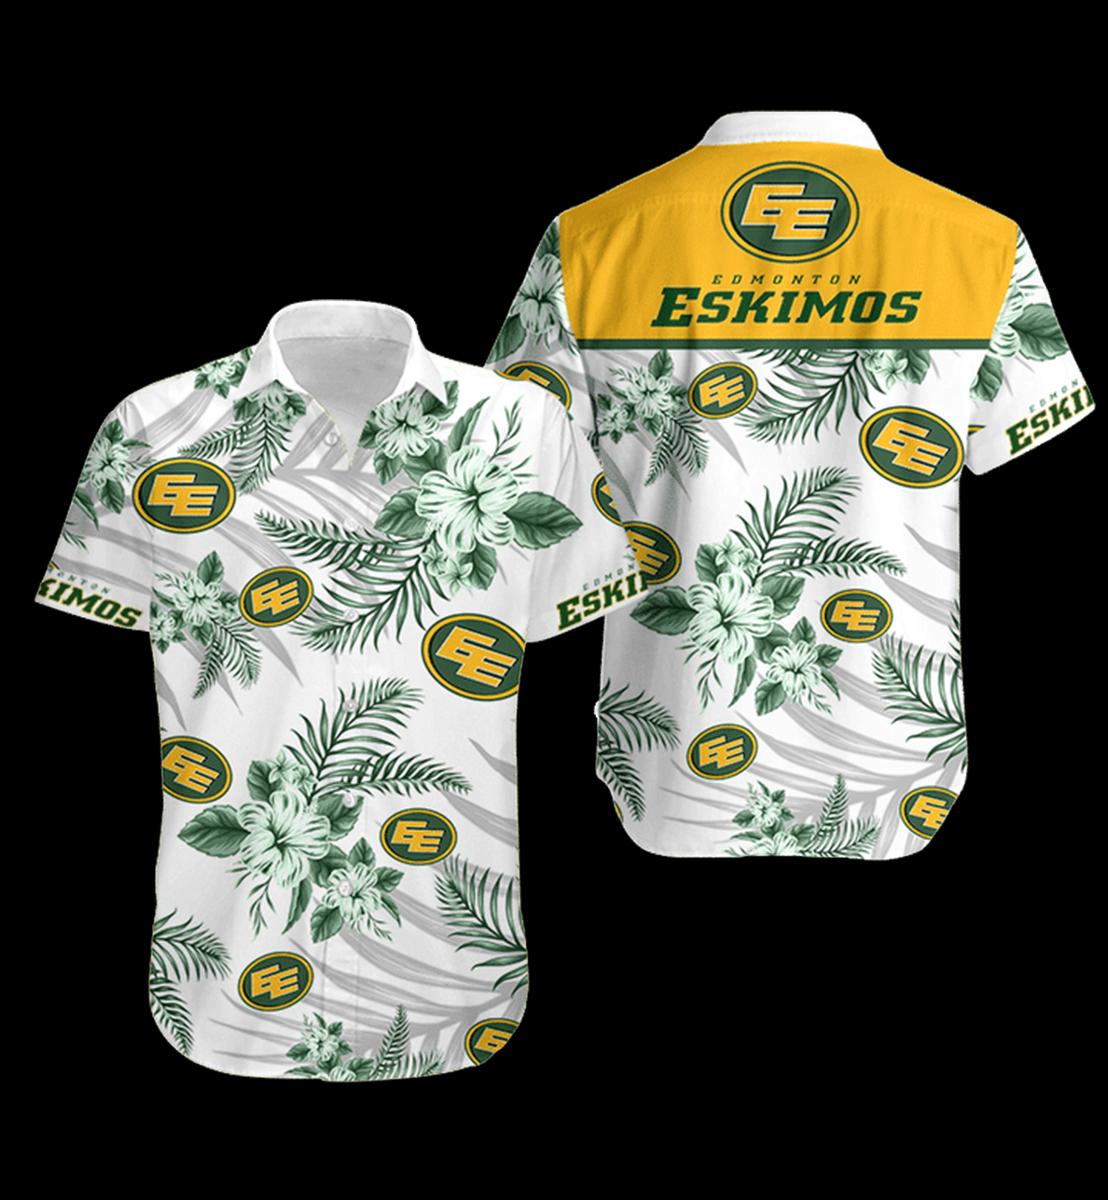 8 Edmonton Eskimos Hawaiian Shirt 1 1